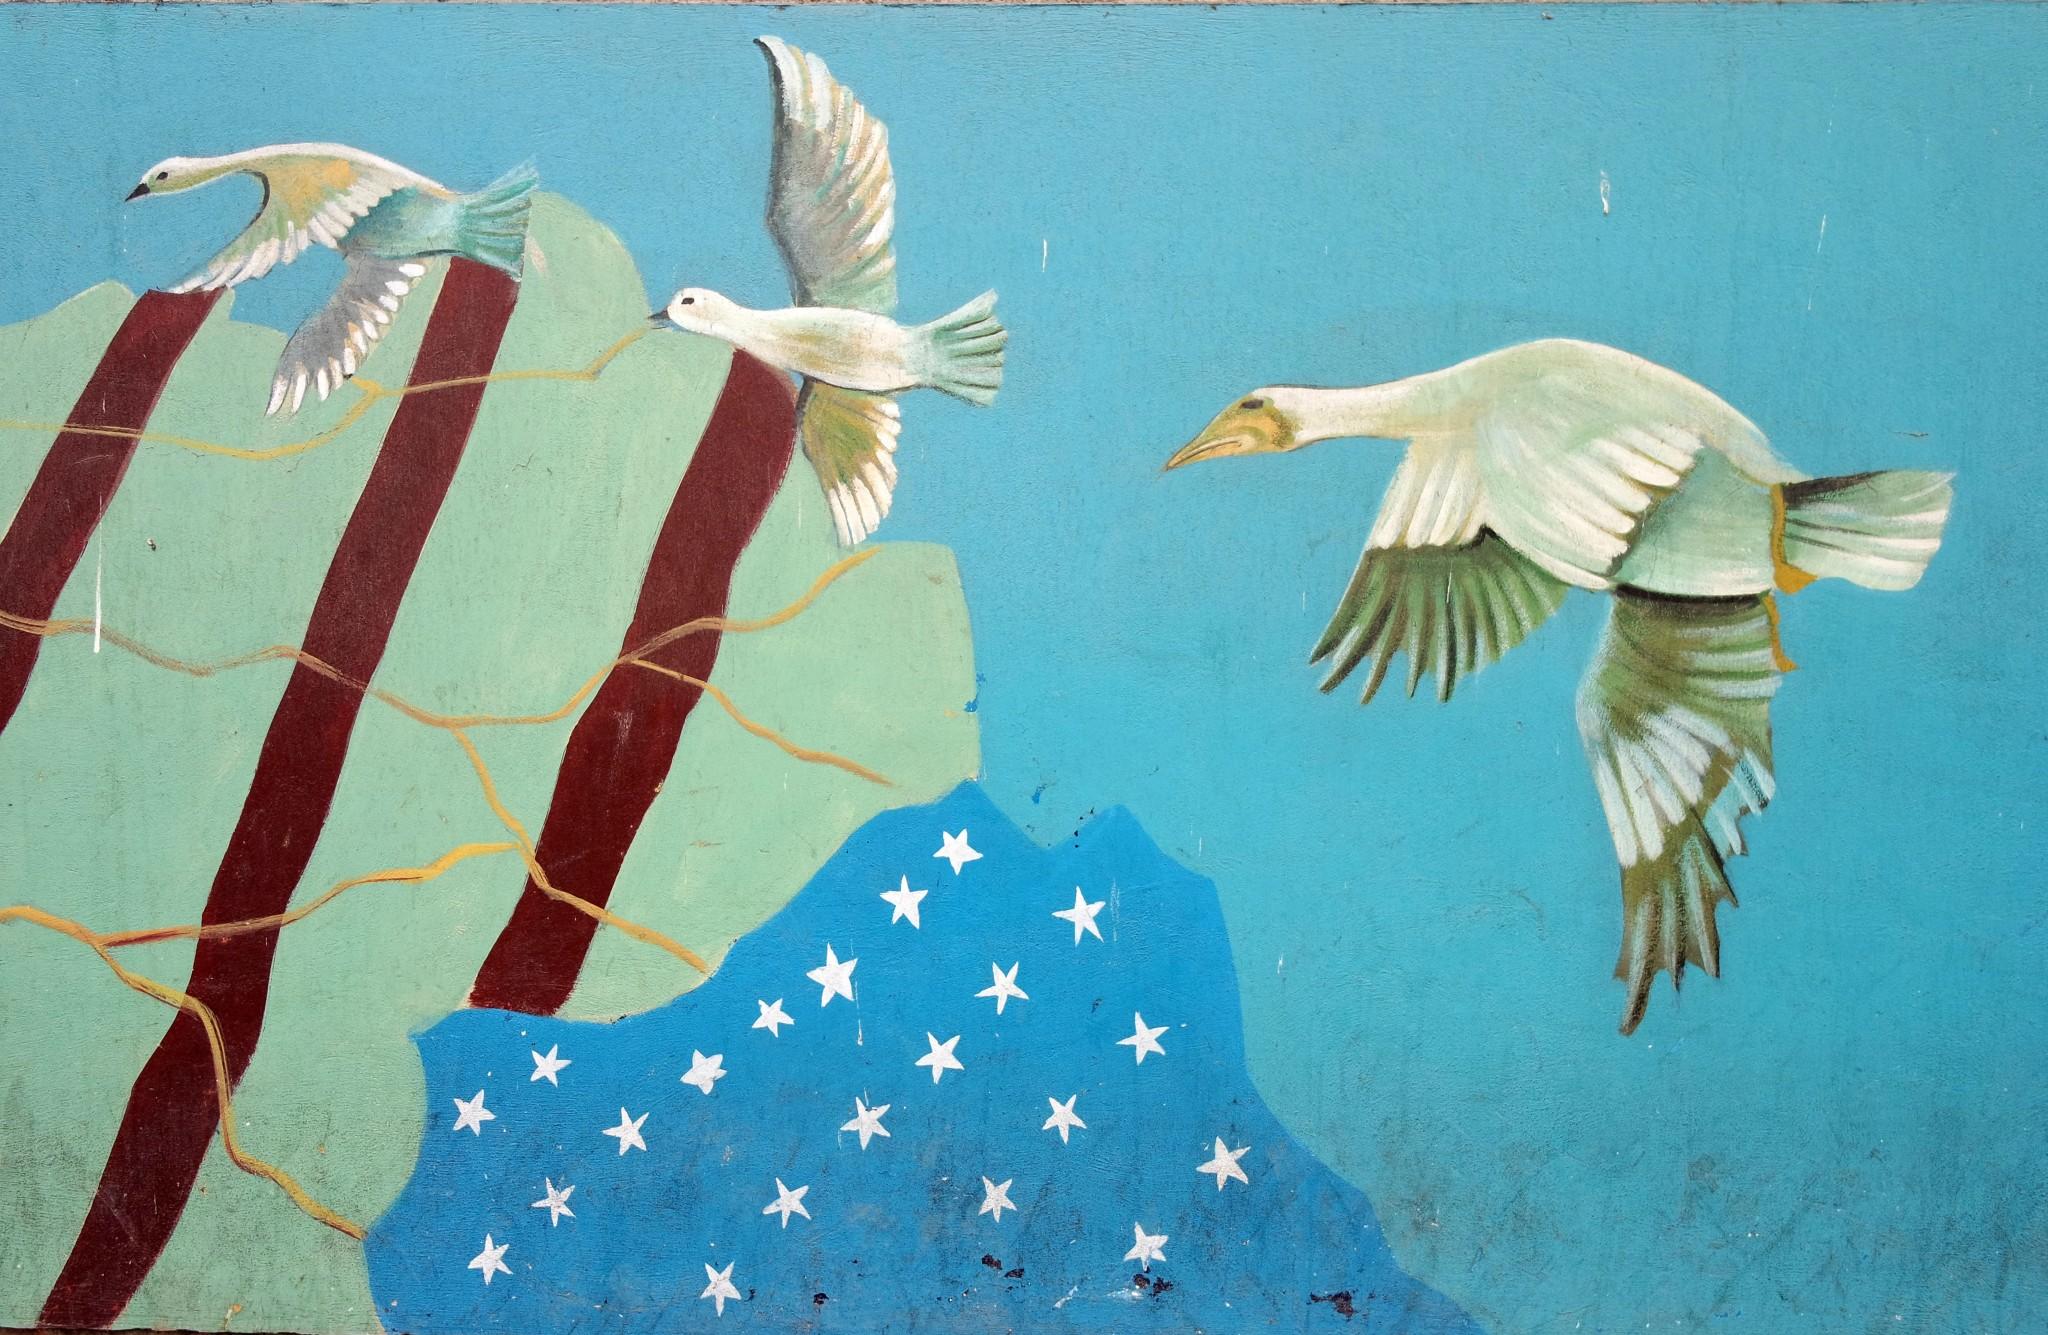 tehran-posolstvo-ameriki